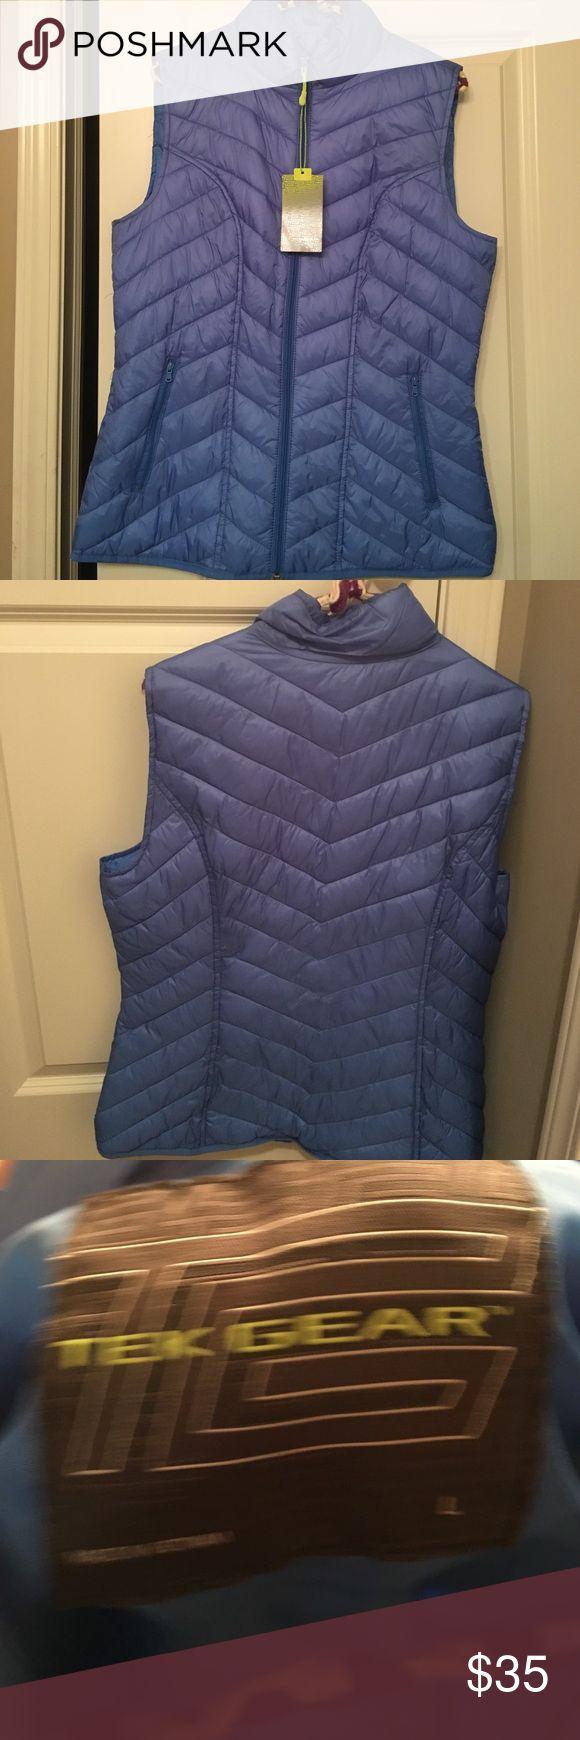 NWT Women's Large Blue Vest! NWT! Women's large blue vest! Has two pockets. Smoke free home tek gear Jackets & Coats Vests